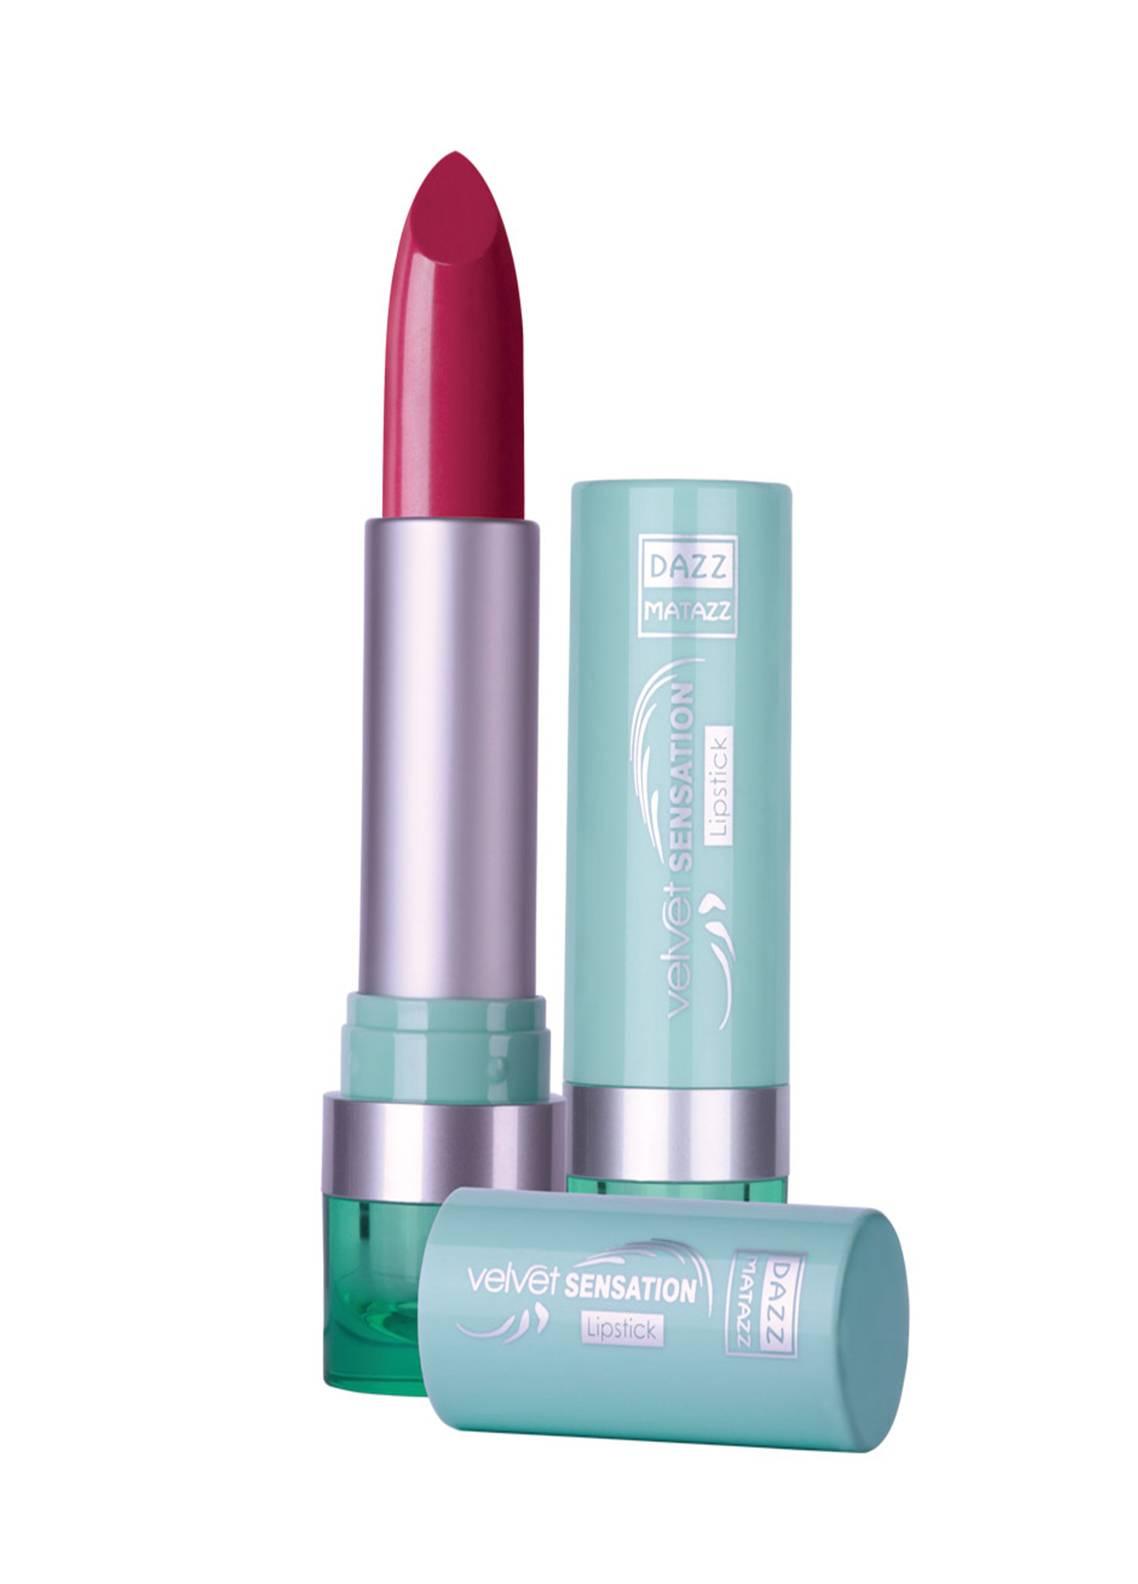 Dazz Matazz Velvet Sensation Lipstick-04 RASPBERRY TRUFFLE